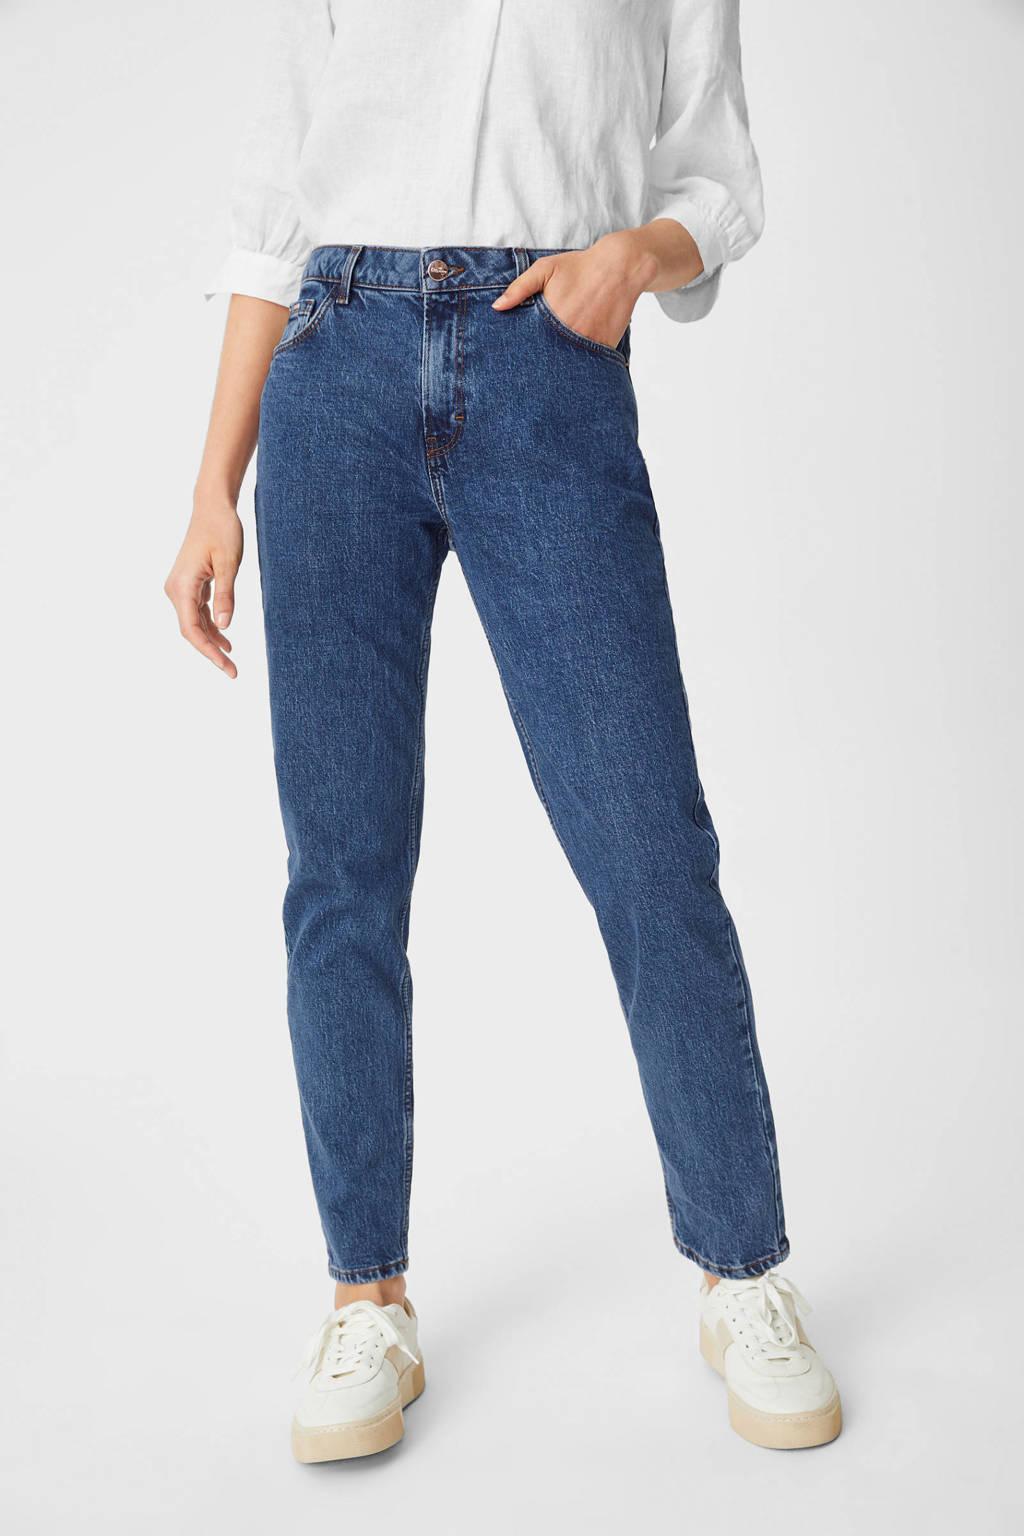 C&A YESSICA PREMIUM high waist straight fit jeans donkerblauw, Donkerblauw